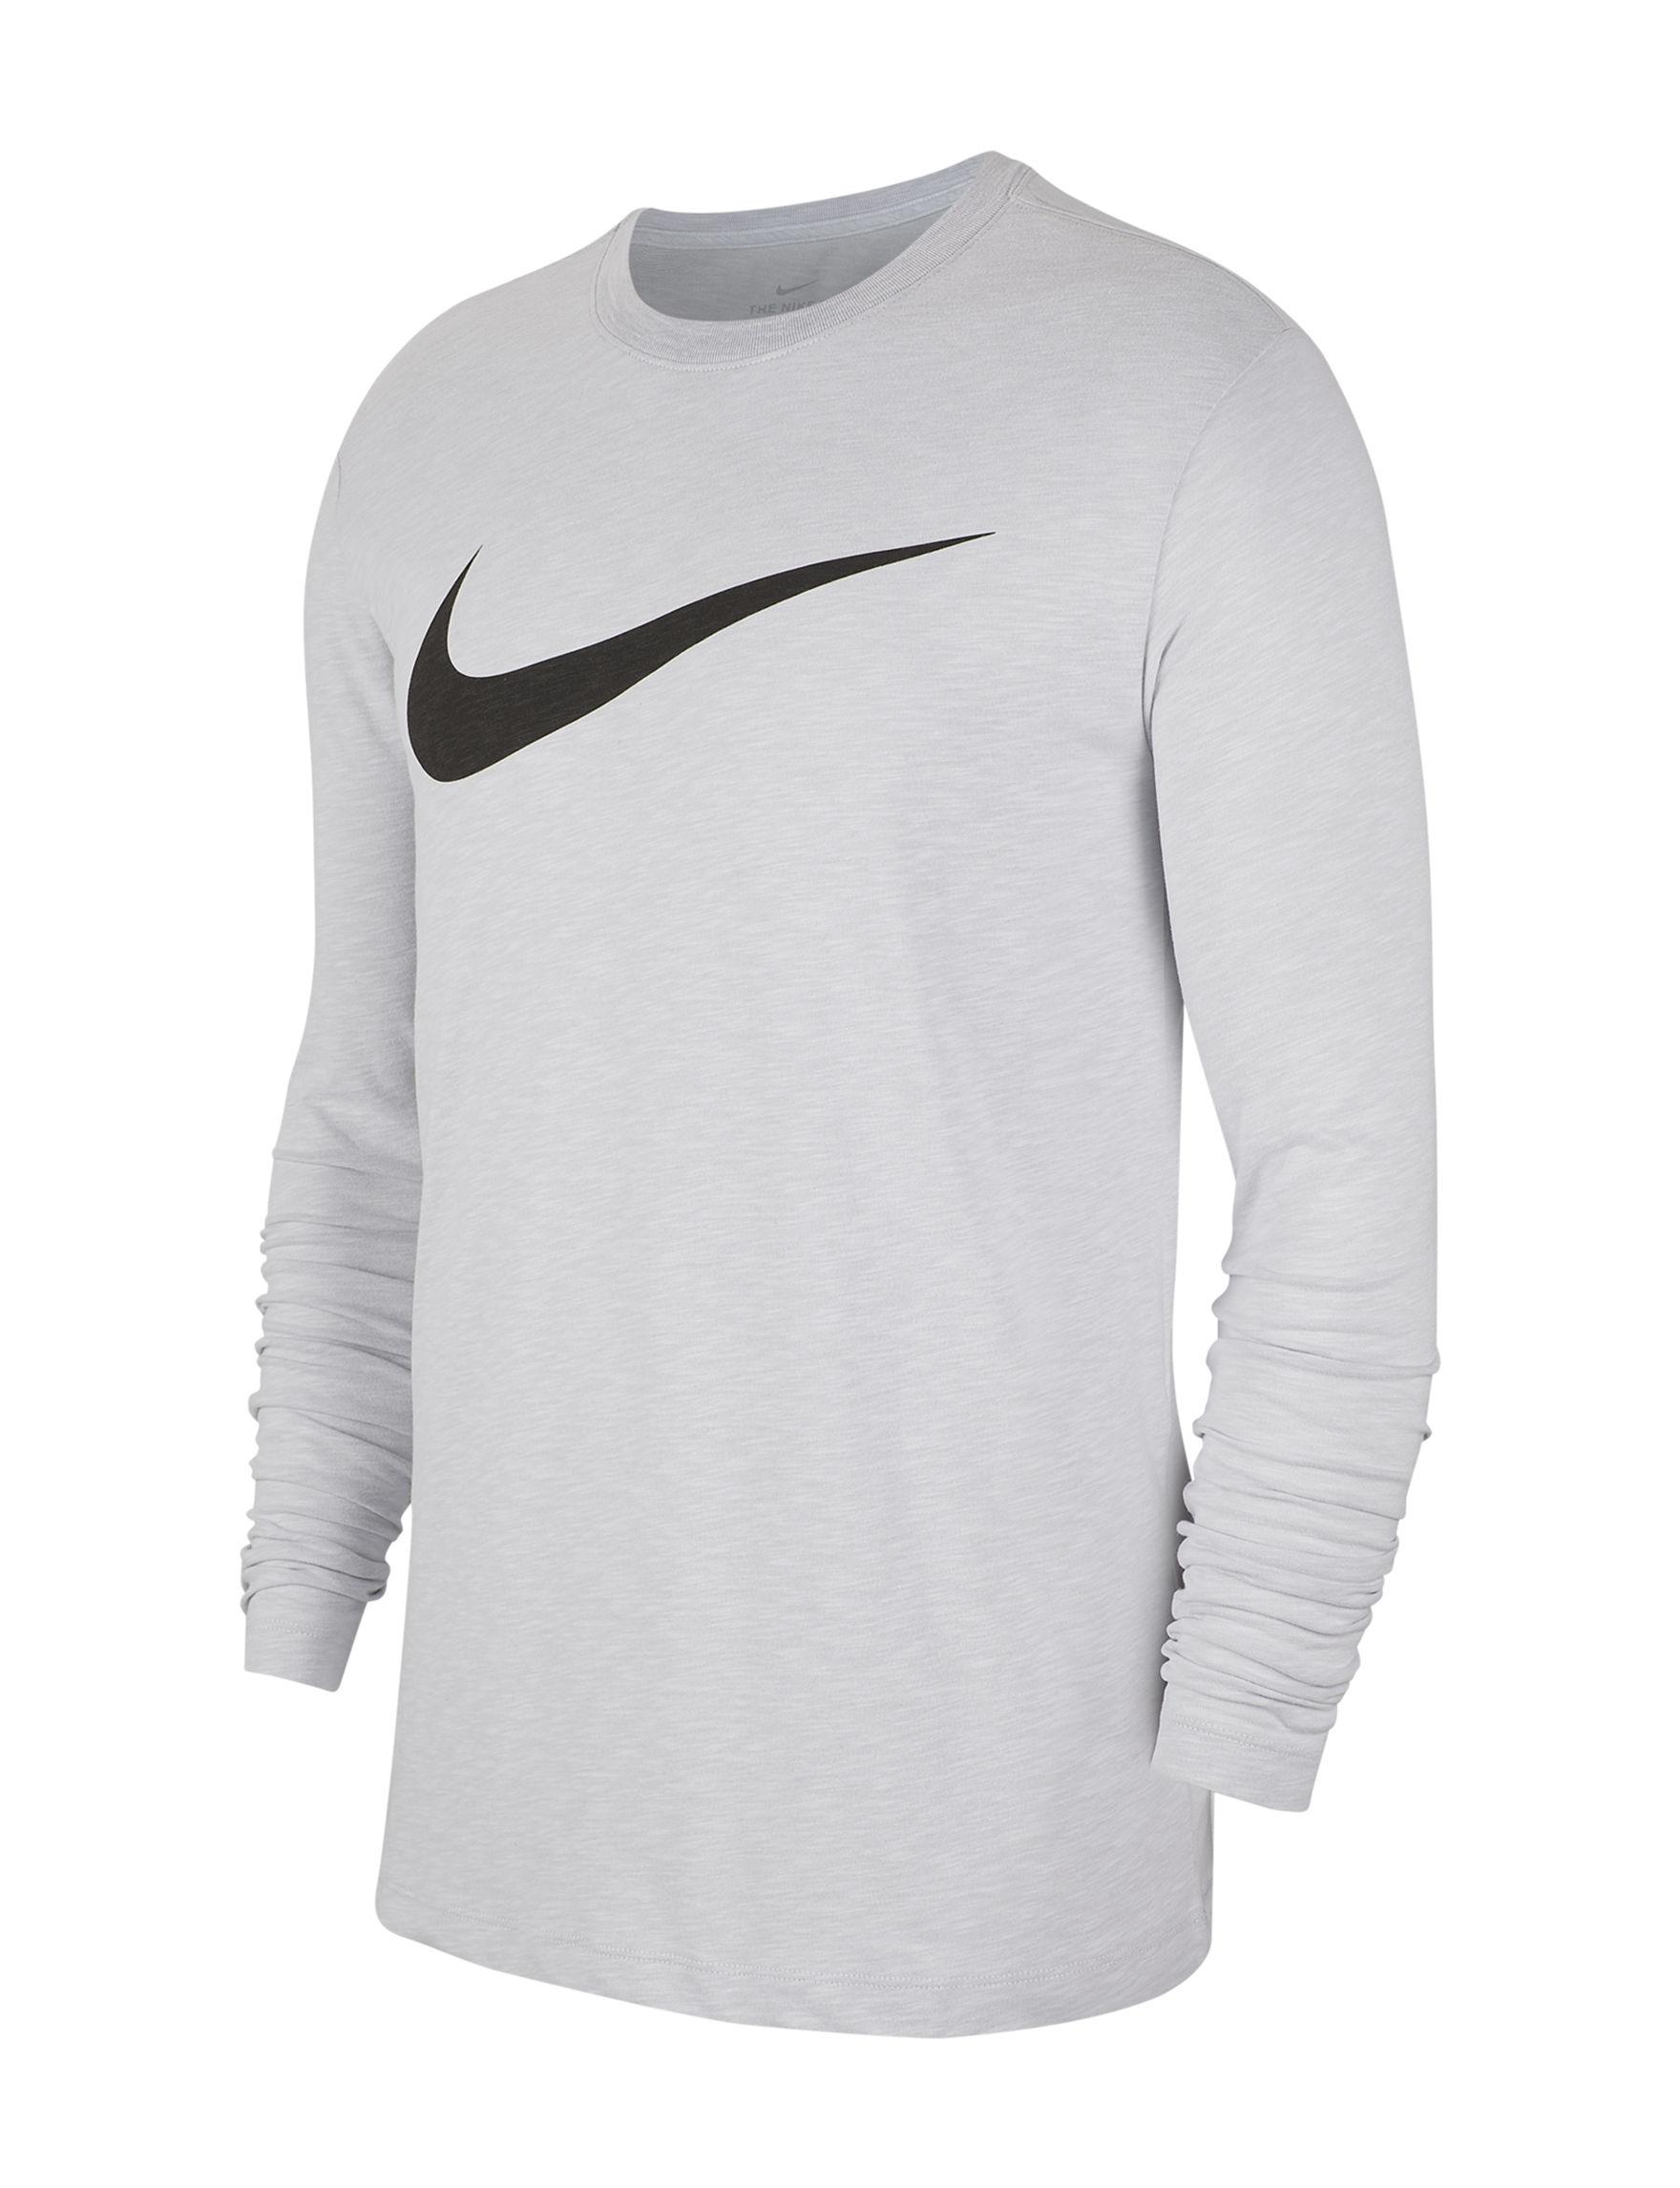 Nike White / Multi Tees & Tanks